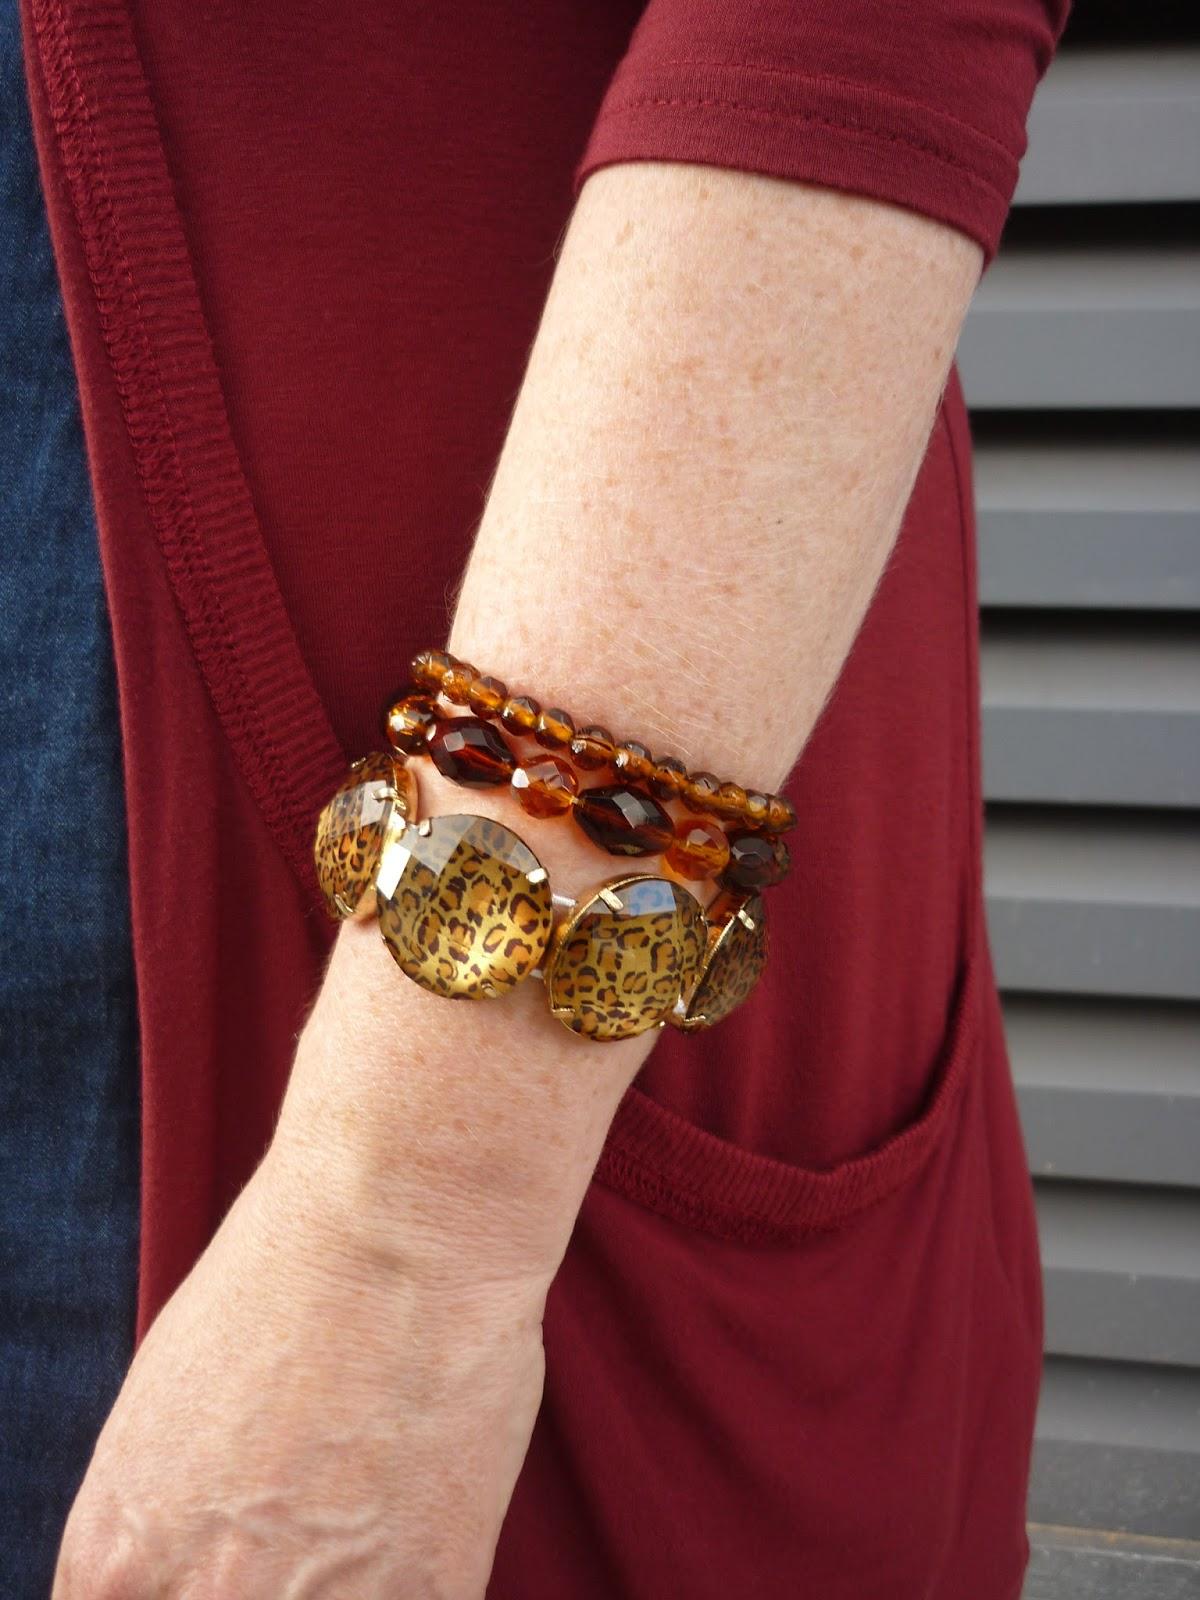 Leopard Print Bracelet & Amber Glass Bracelets | Petite Silver Vixen